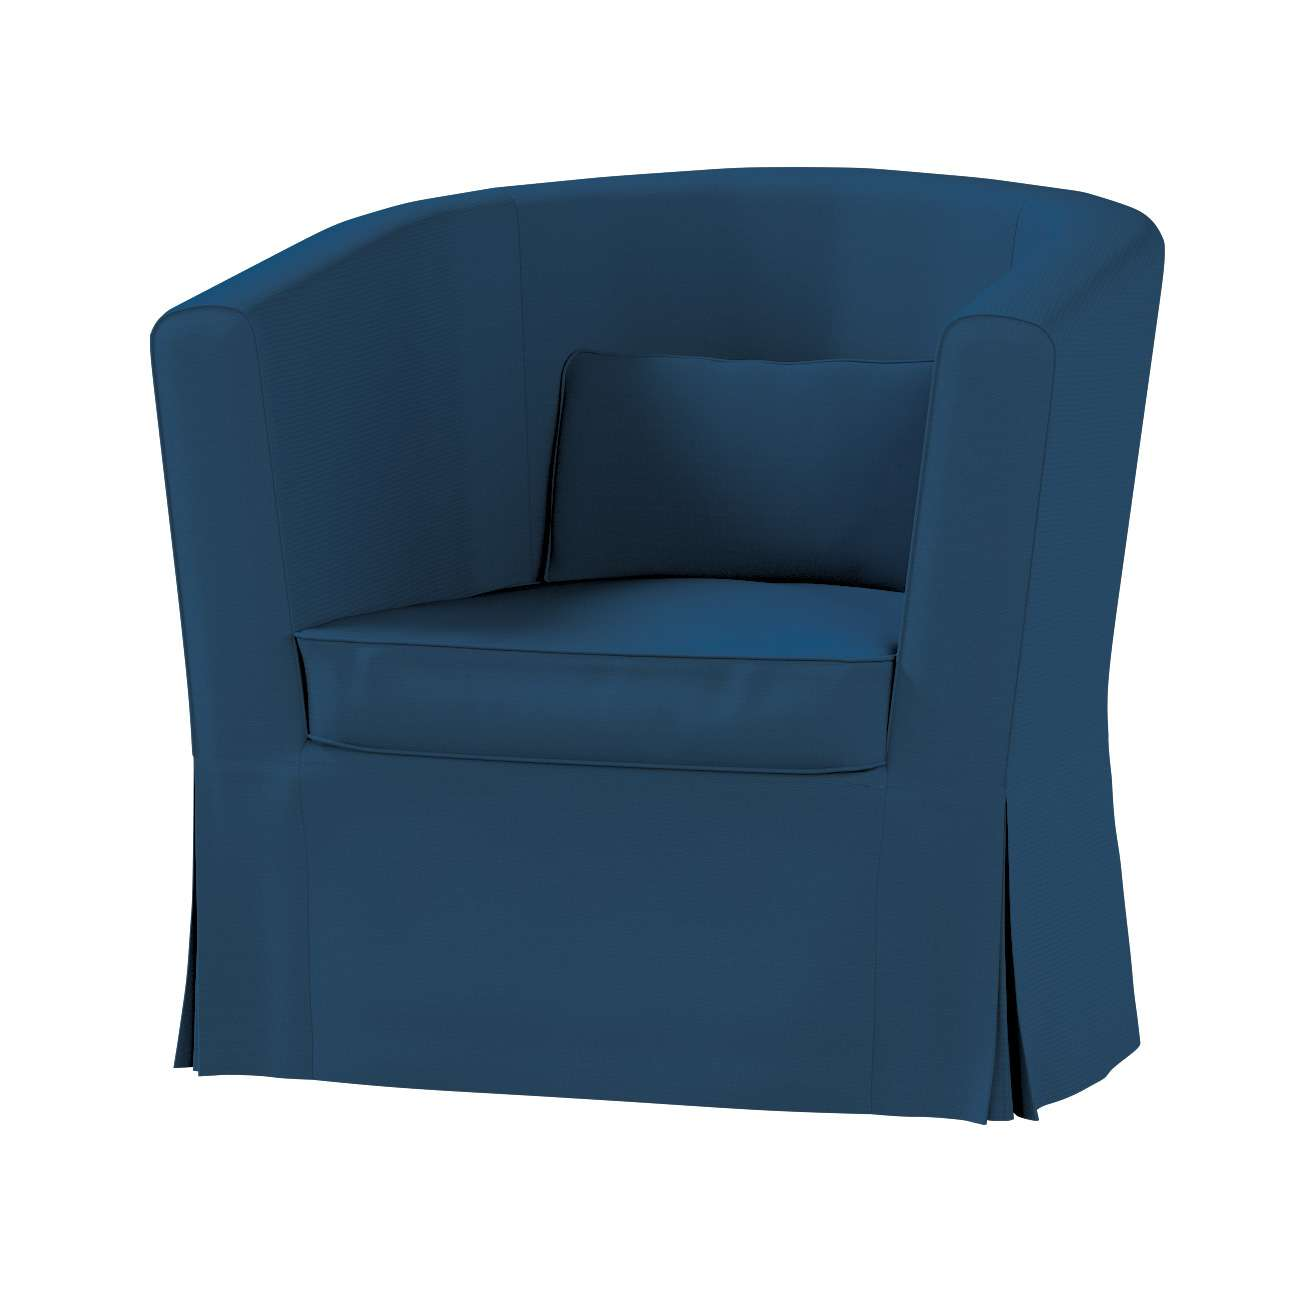 Potah na křeslo IKEA Ektorp Tullsta křeslo Ektorp Tullsta v kolekci Cotton Panama, látka: 702-30